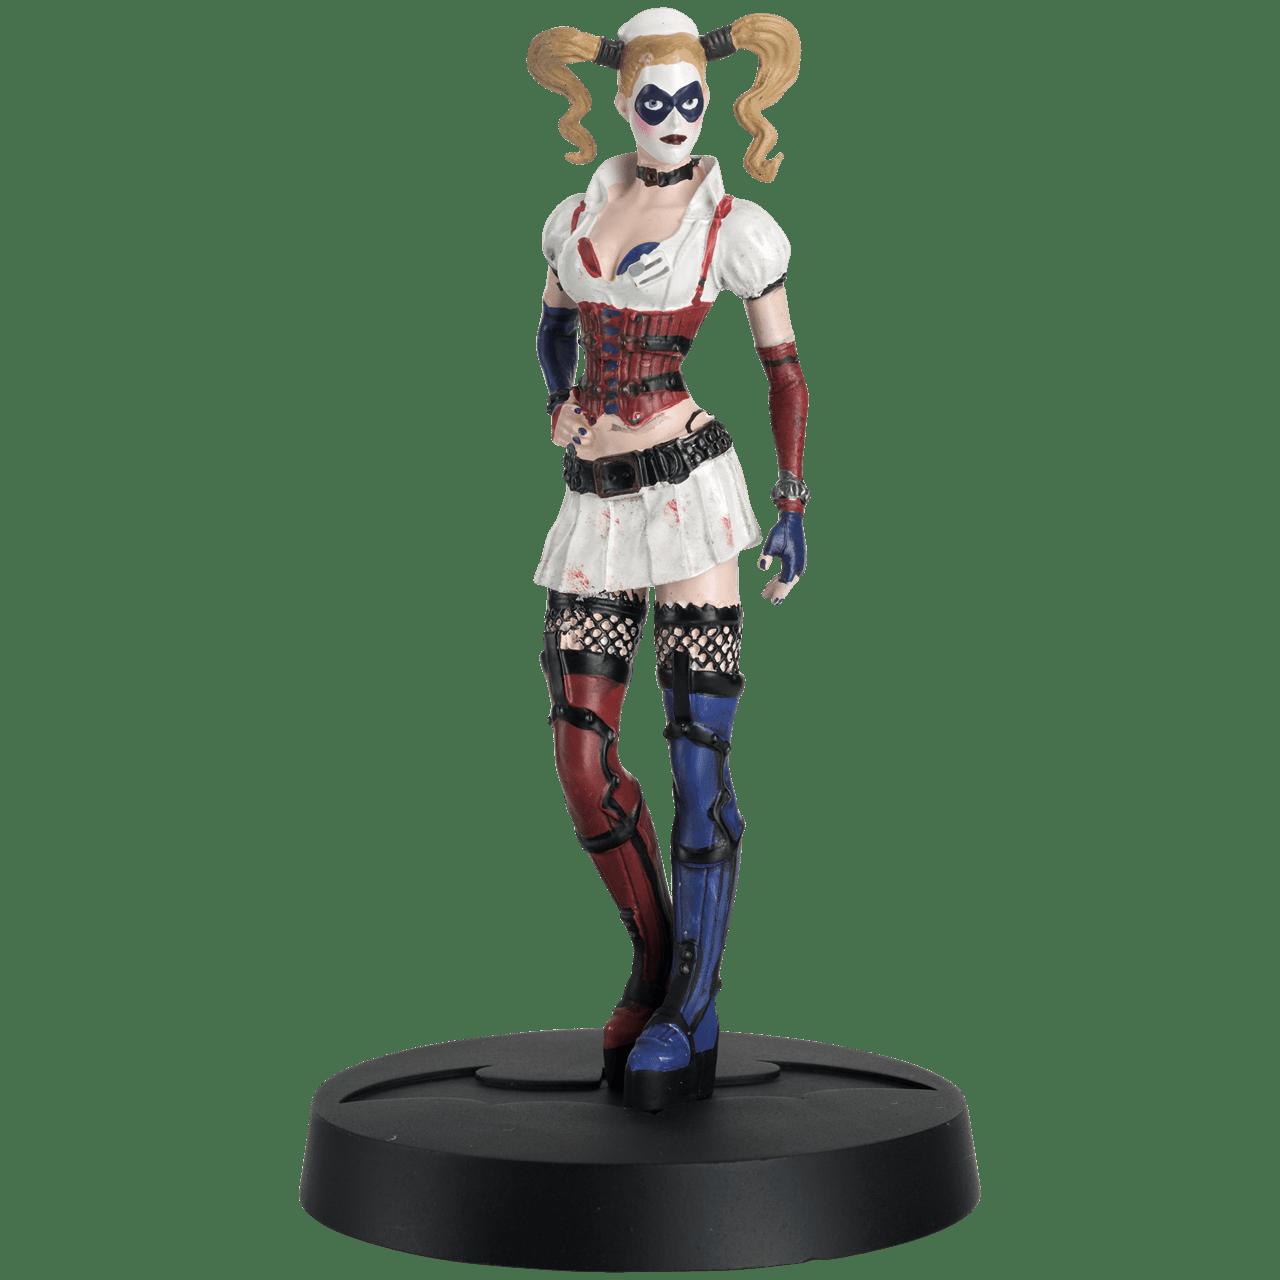 Batman: Arkham Asylum 3 Figurine Set: Batman, Joker, Harley: Hero Collector - 4